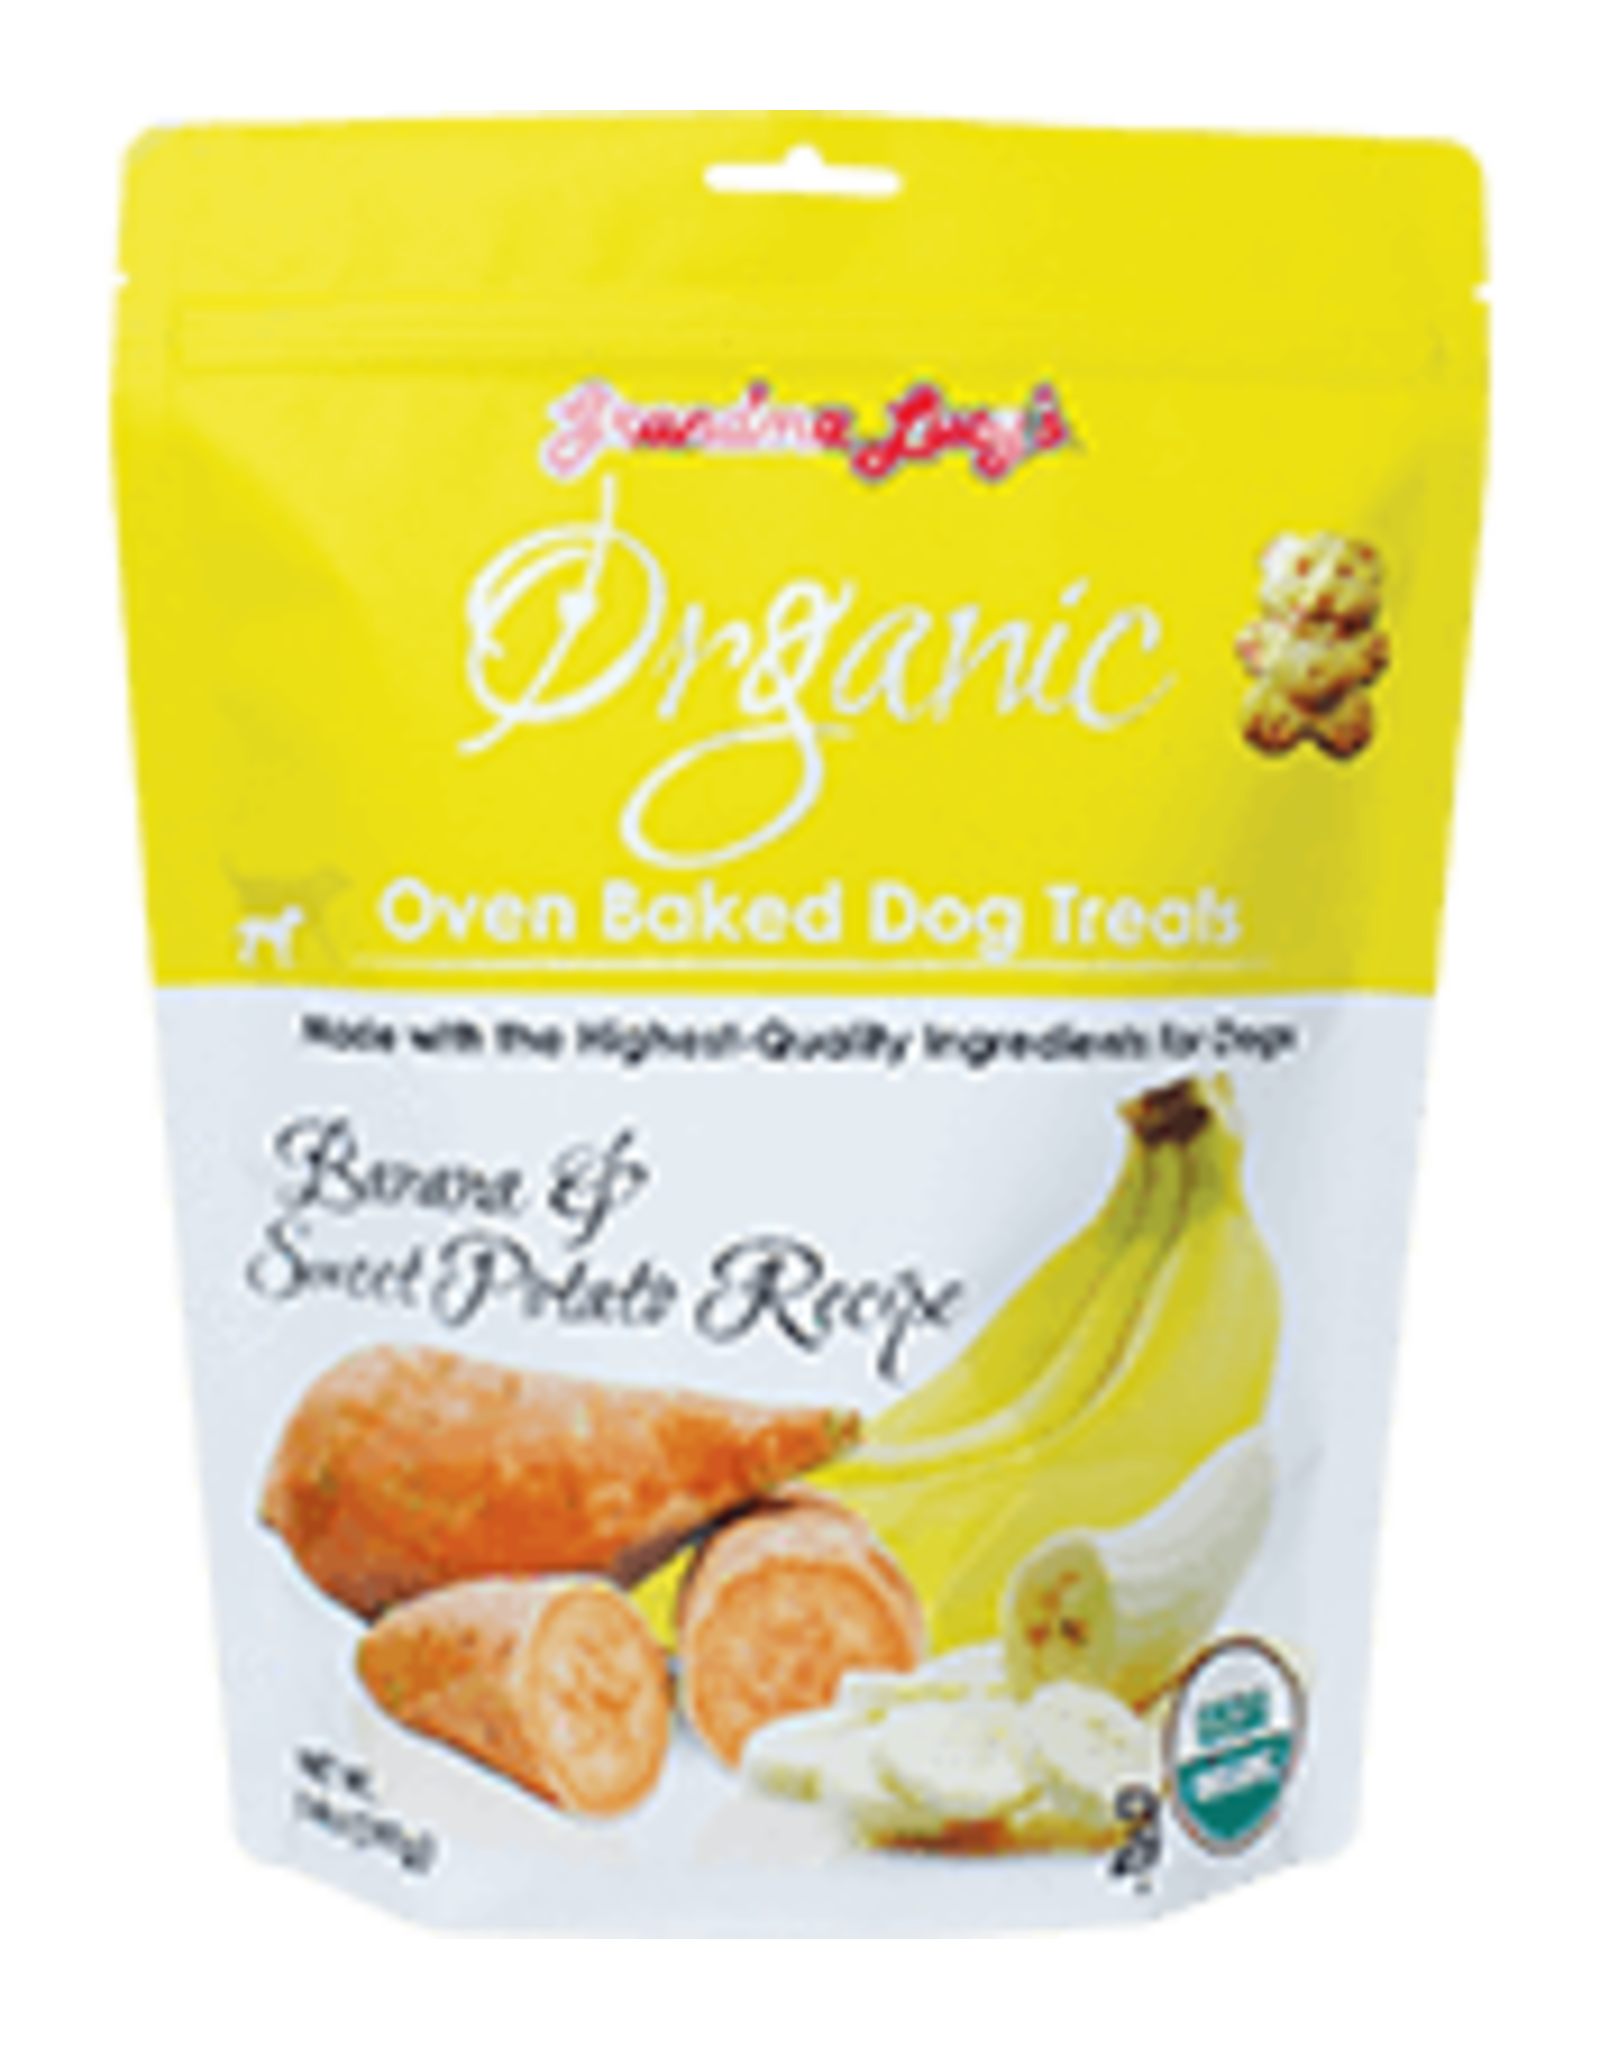 Grandma Lucy's Grandma Lucy's Organic Baked \ Banana & Sw Pot 14oz